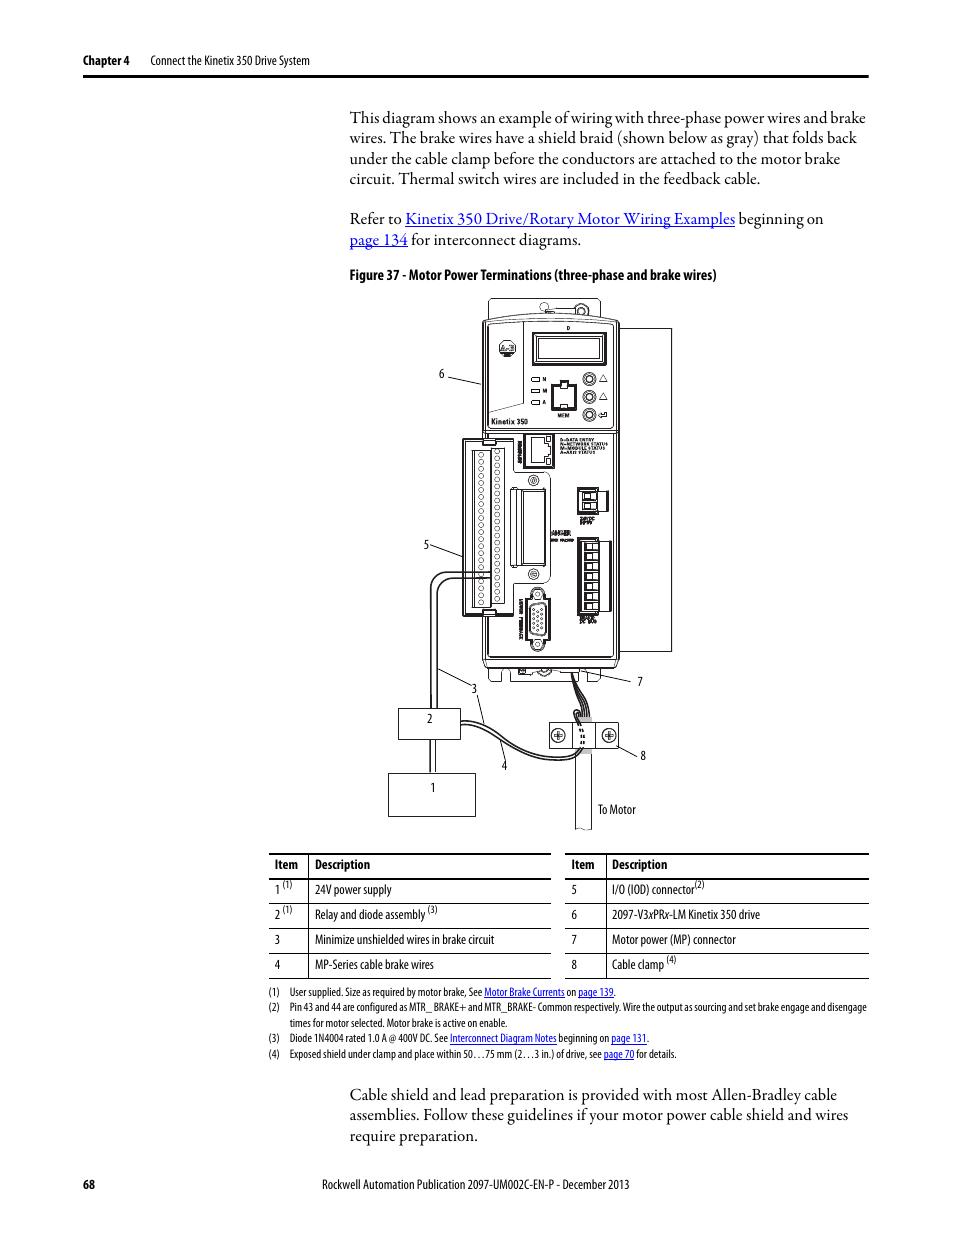 Rockwell Automation 2097-Vxxx Kinetix 350 Single-axis EtherNet/IP ...